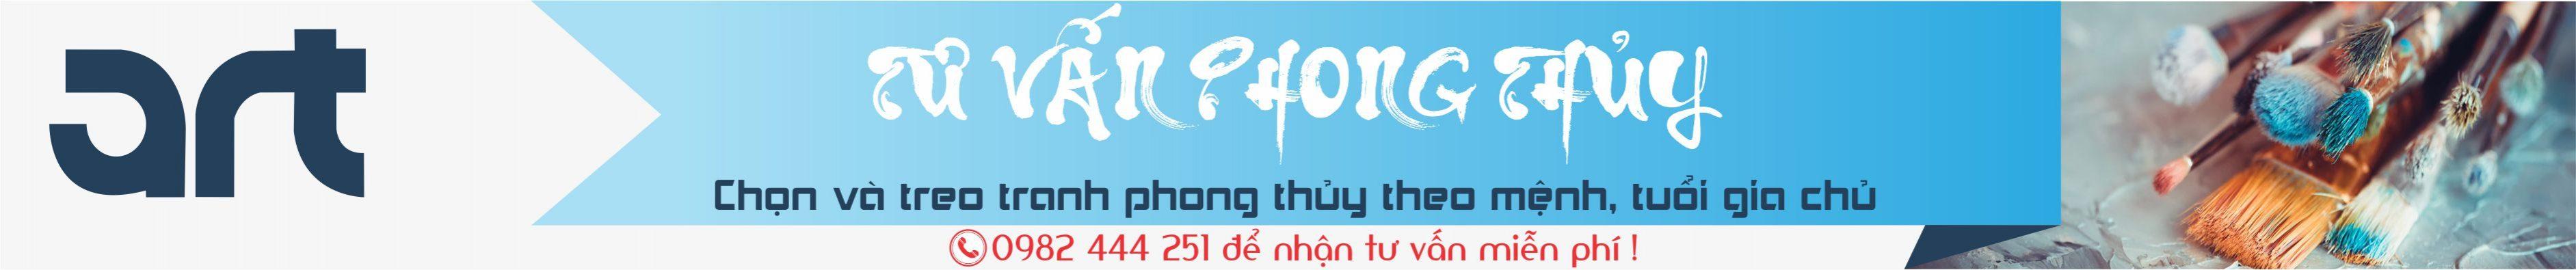 tu-van-cach-chon-va-treo-tranh-theo-phong-thuy-baner